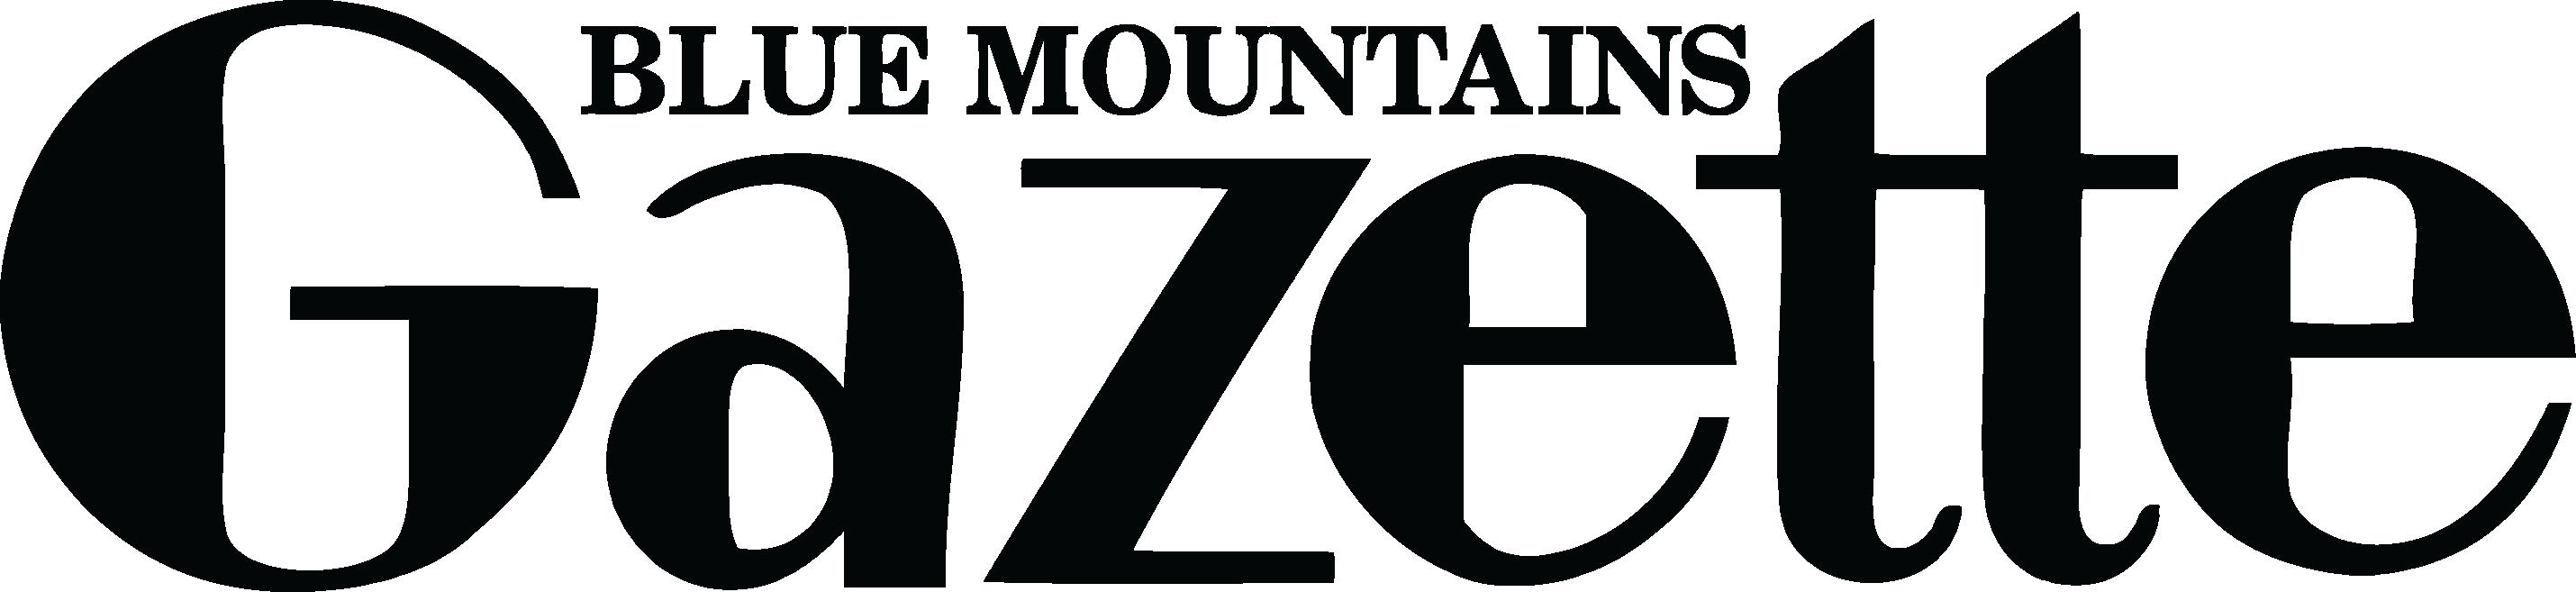 Blue Mountains Gazette